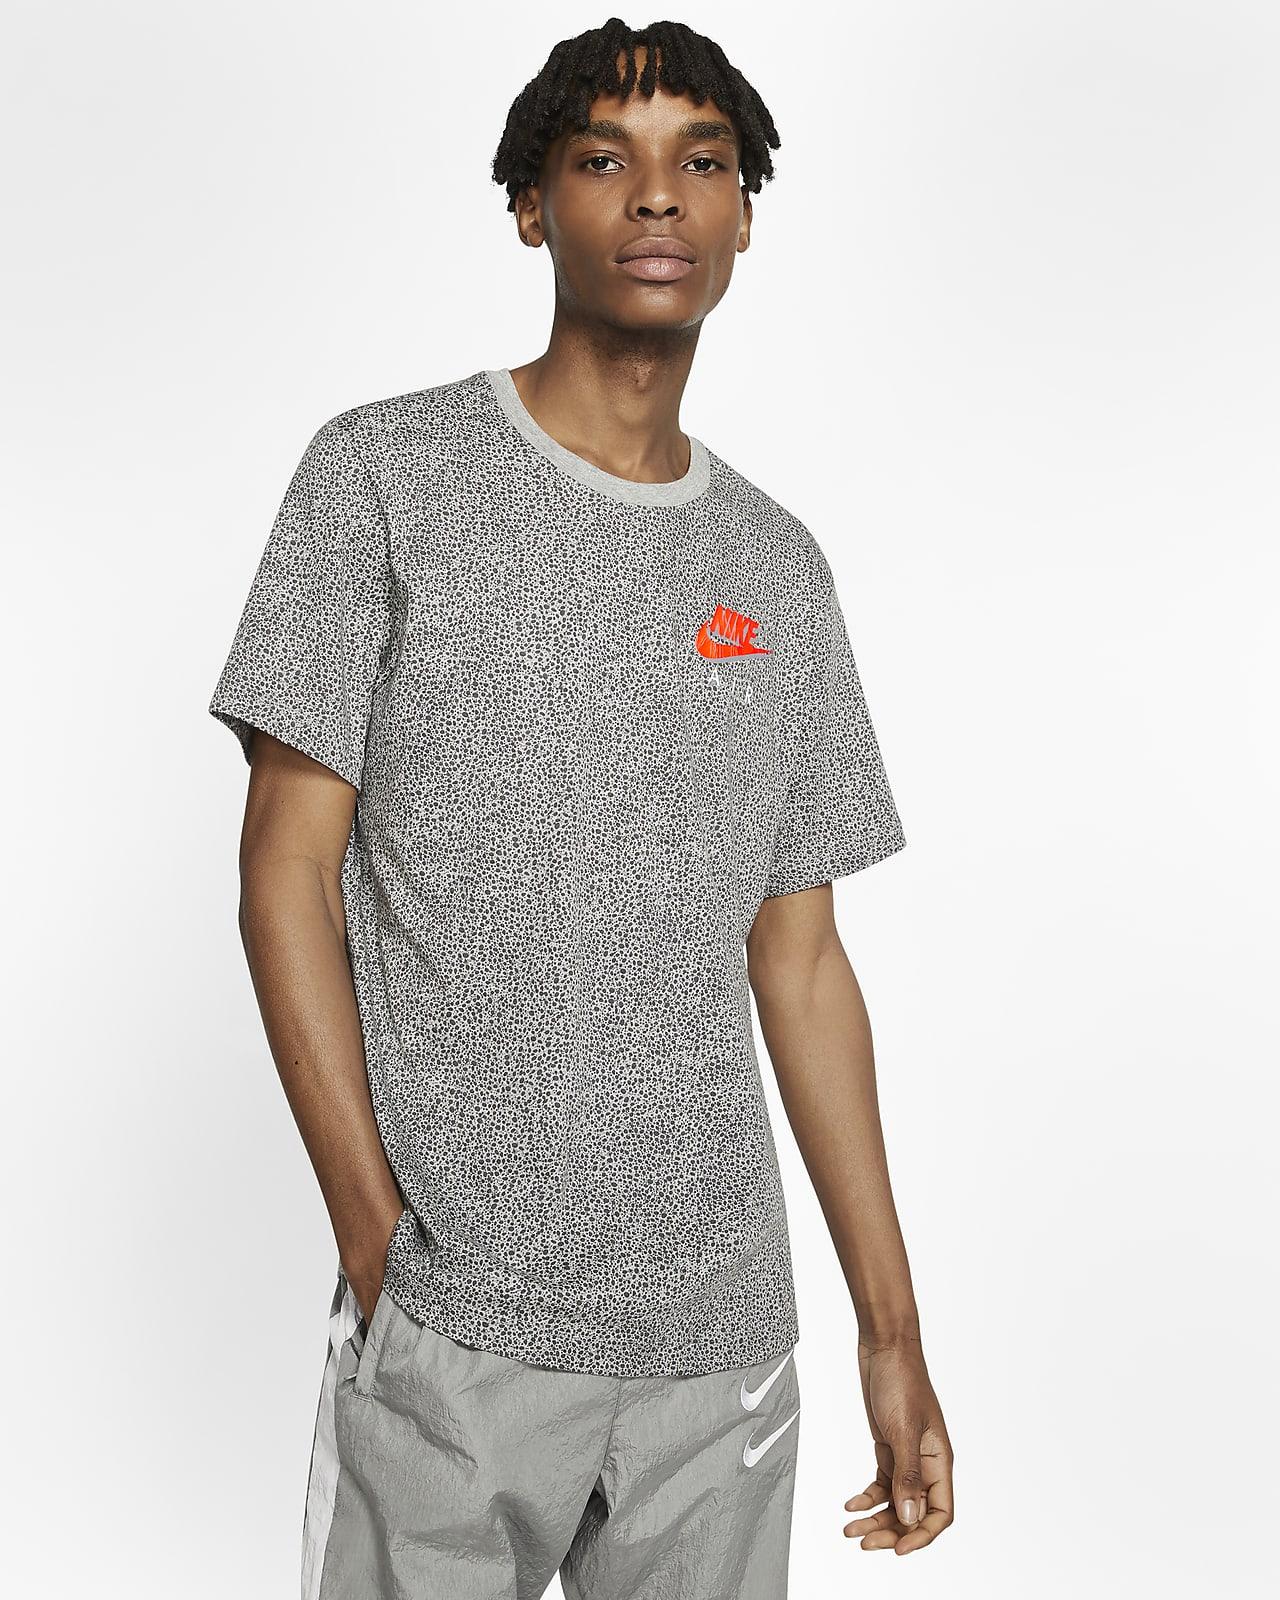 Nike SB Men's Printed T-Shirt